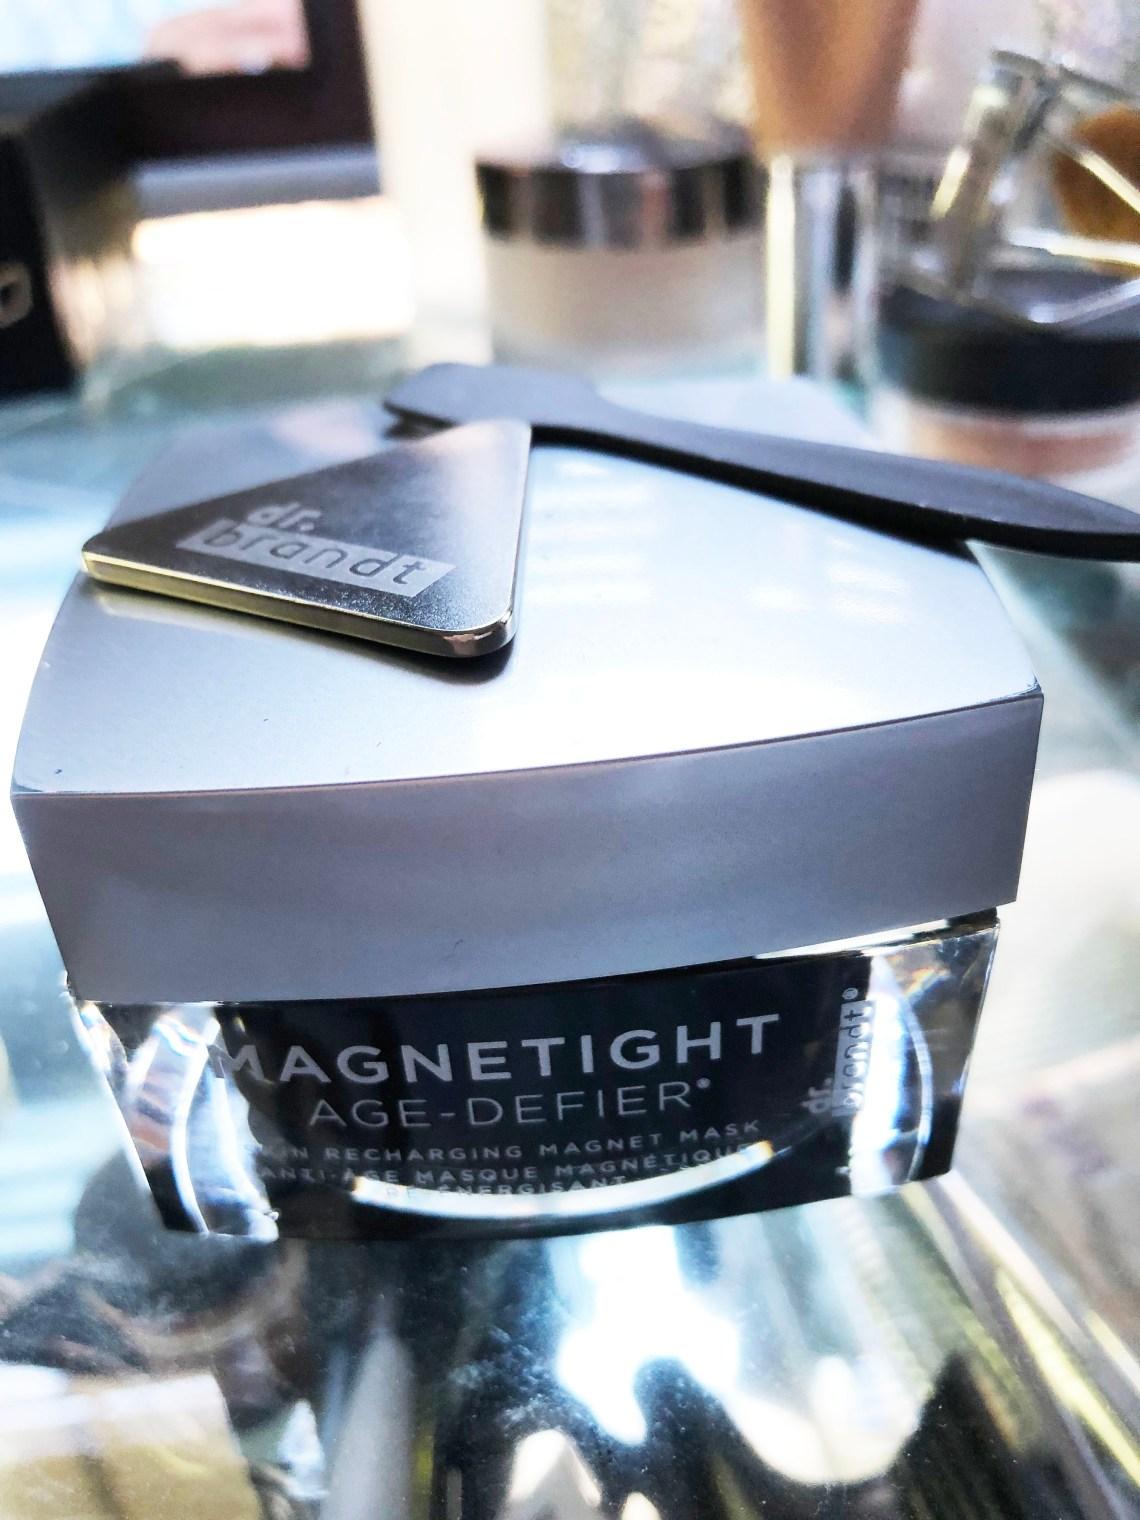 Magnetight Age-Defier Mask